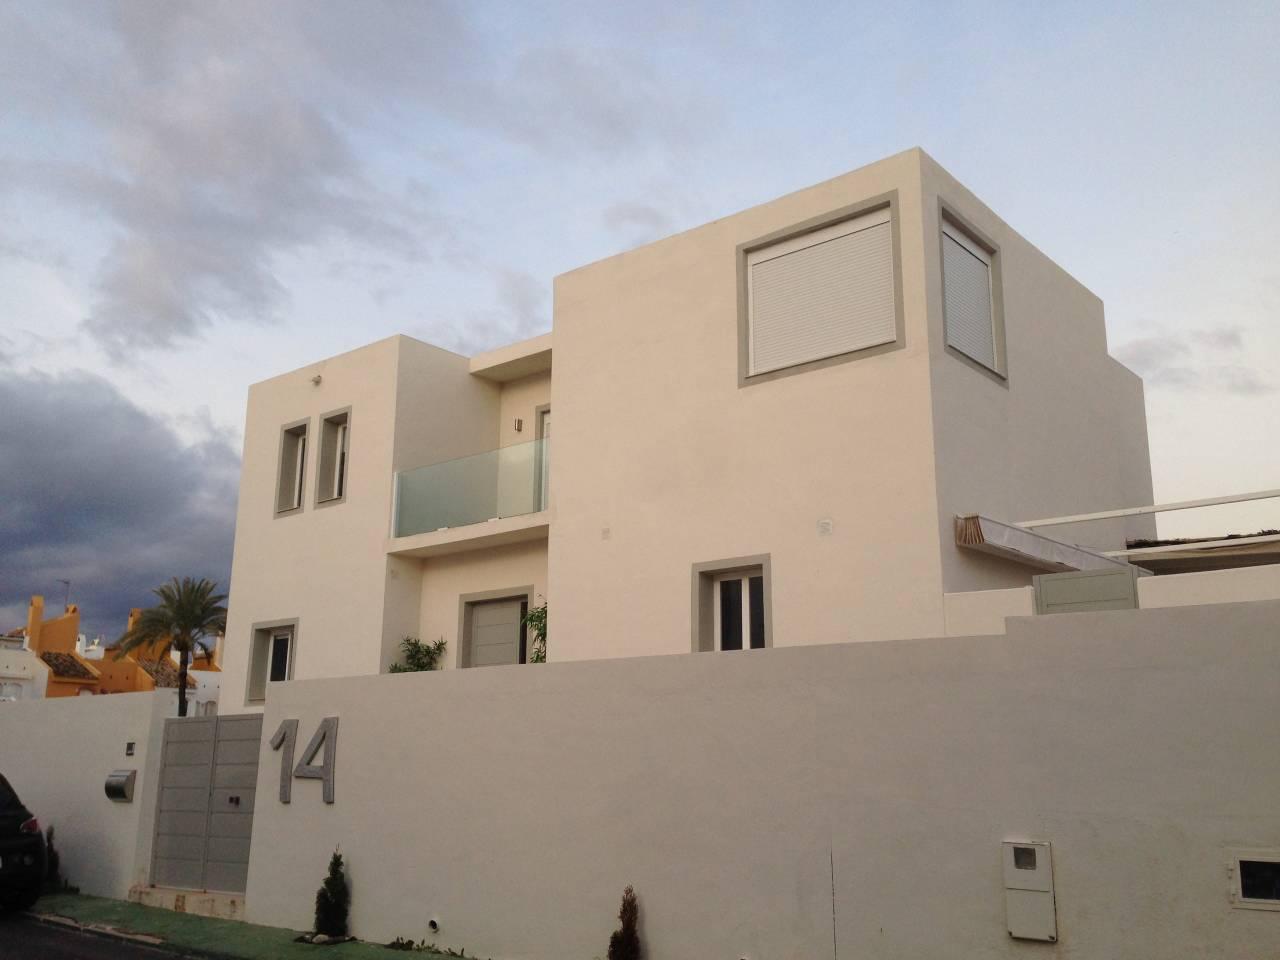 Apartment luxury 6 rooms villa with pool   jacuzzi - P banus photo 25662525